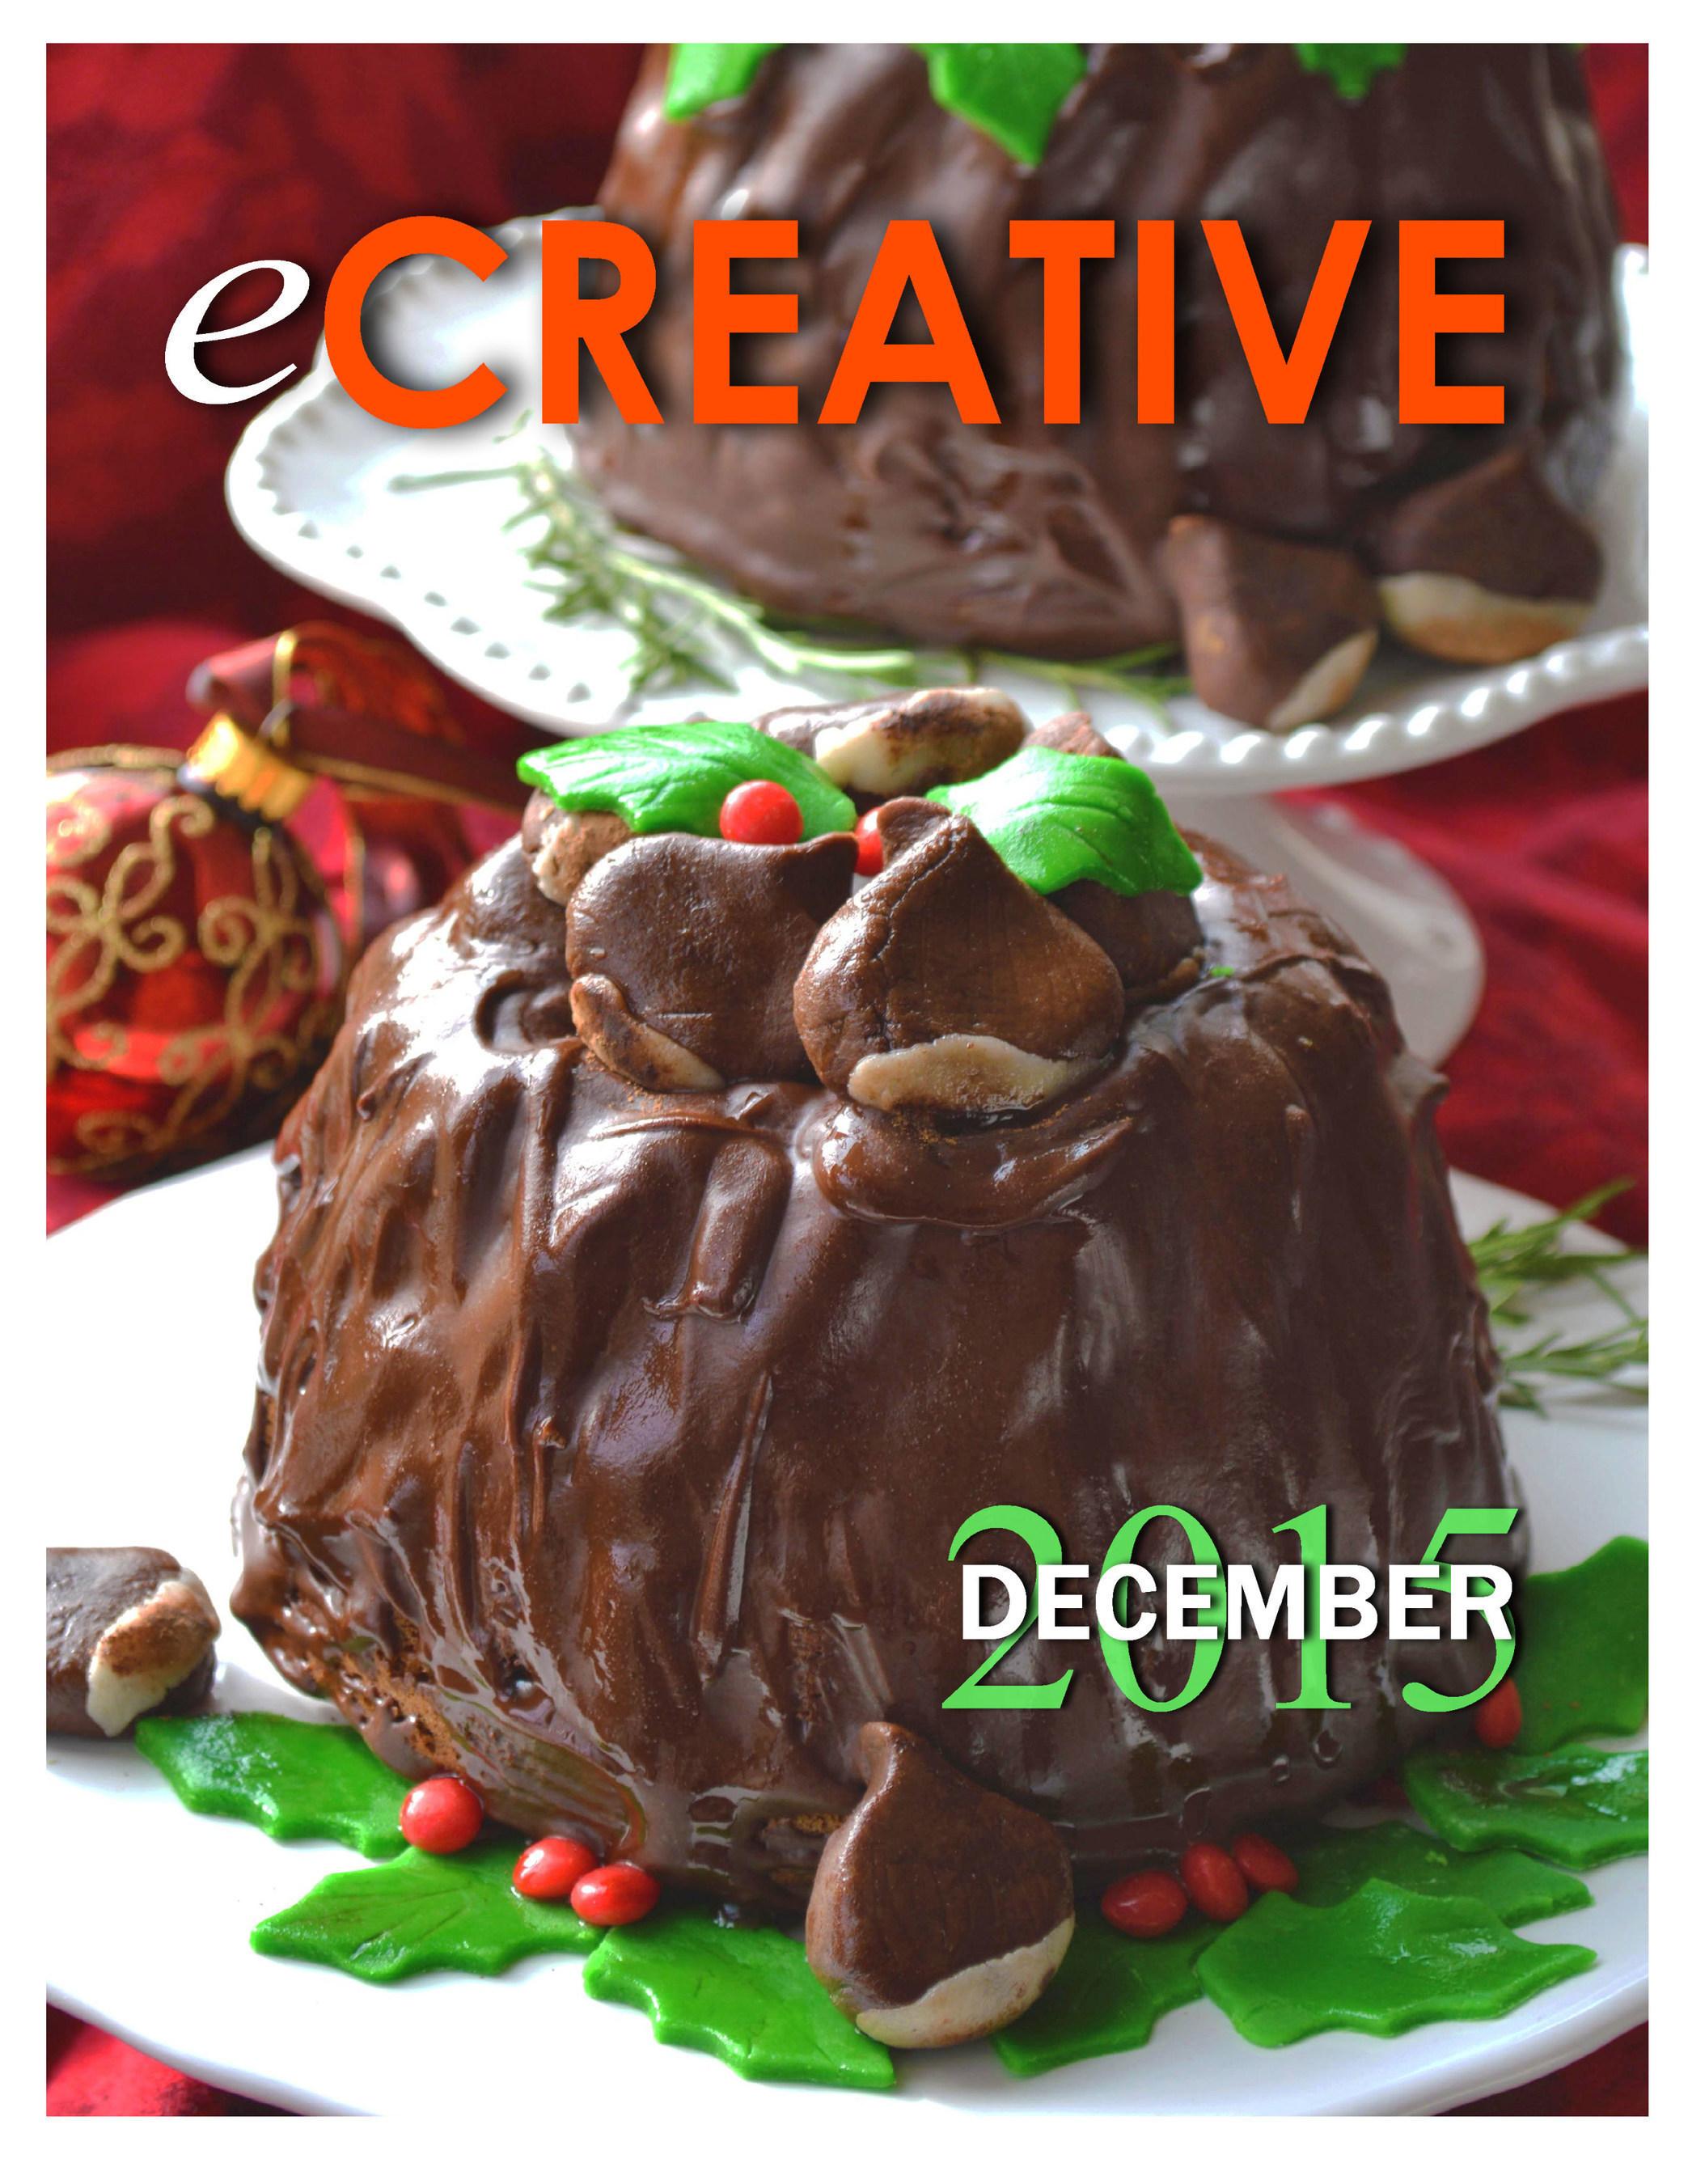 eCREATIVE Magazine Serves Tech-Savvy Readers a Digital Dish